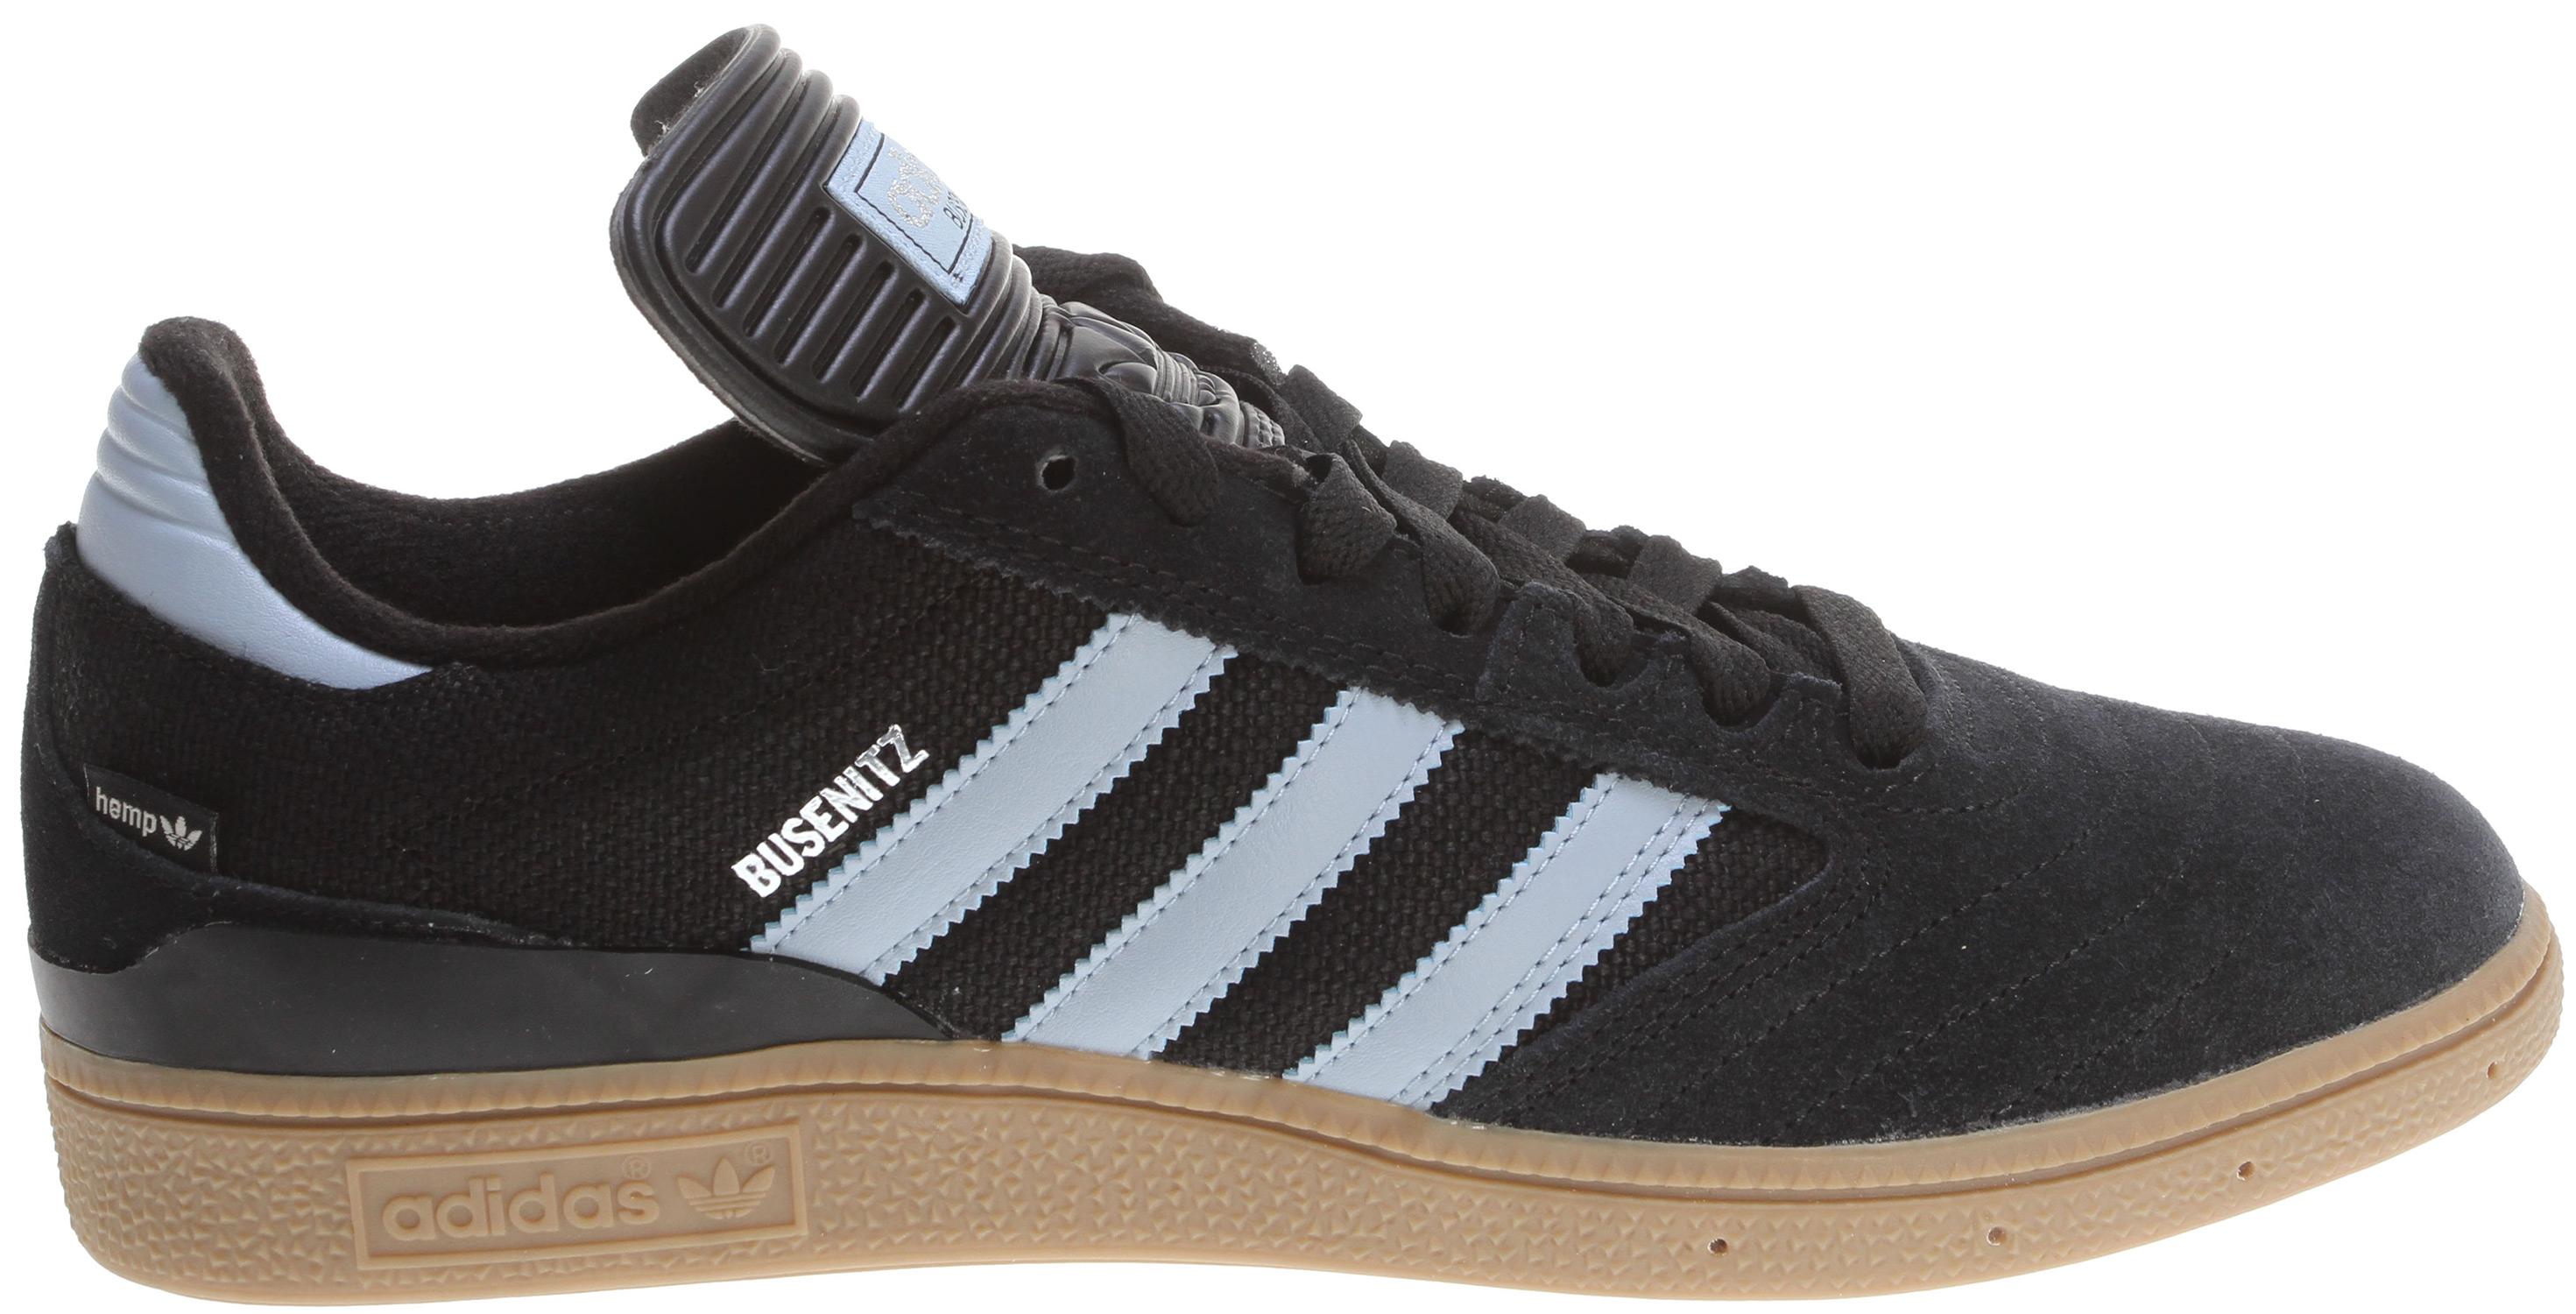 adidas busenitz pro skate shoes - thumbnail 1 HIRNMIG